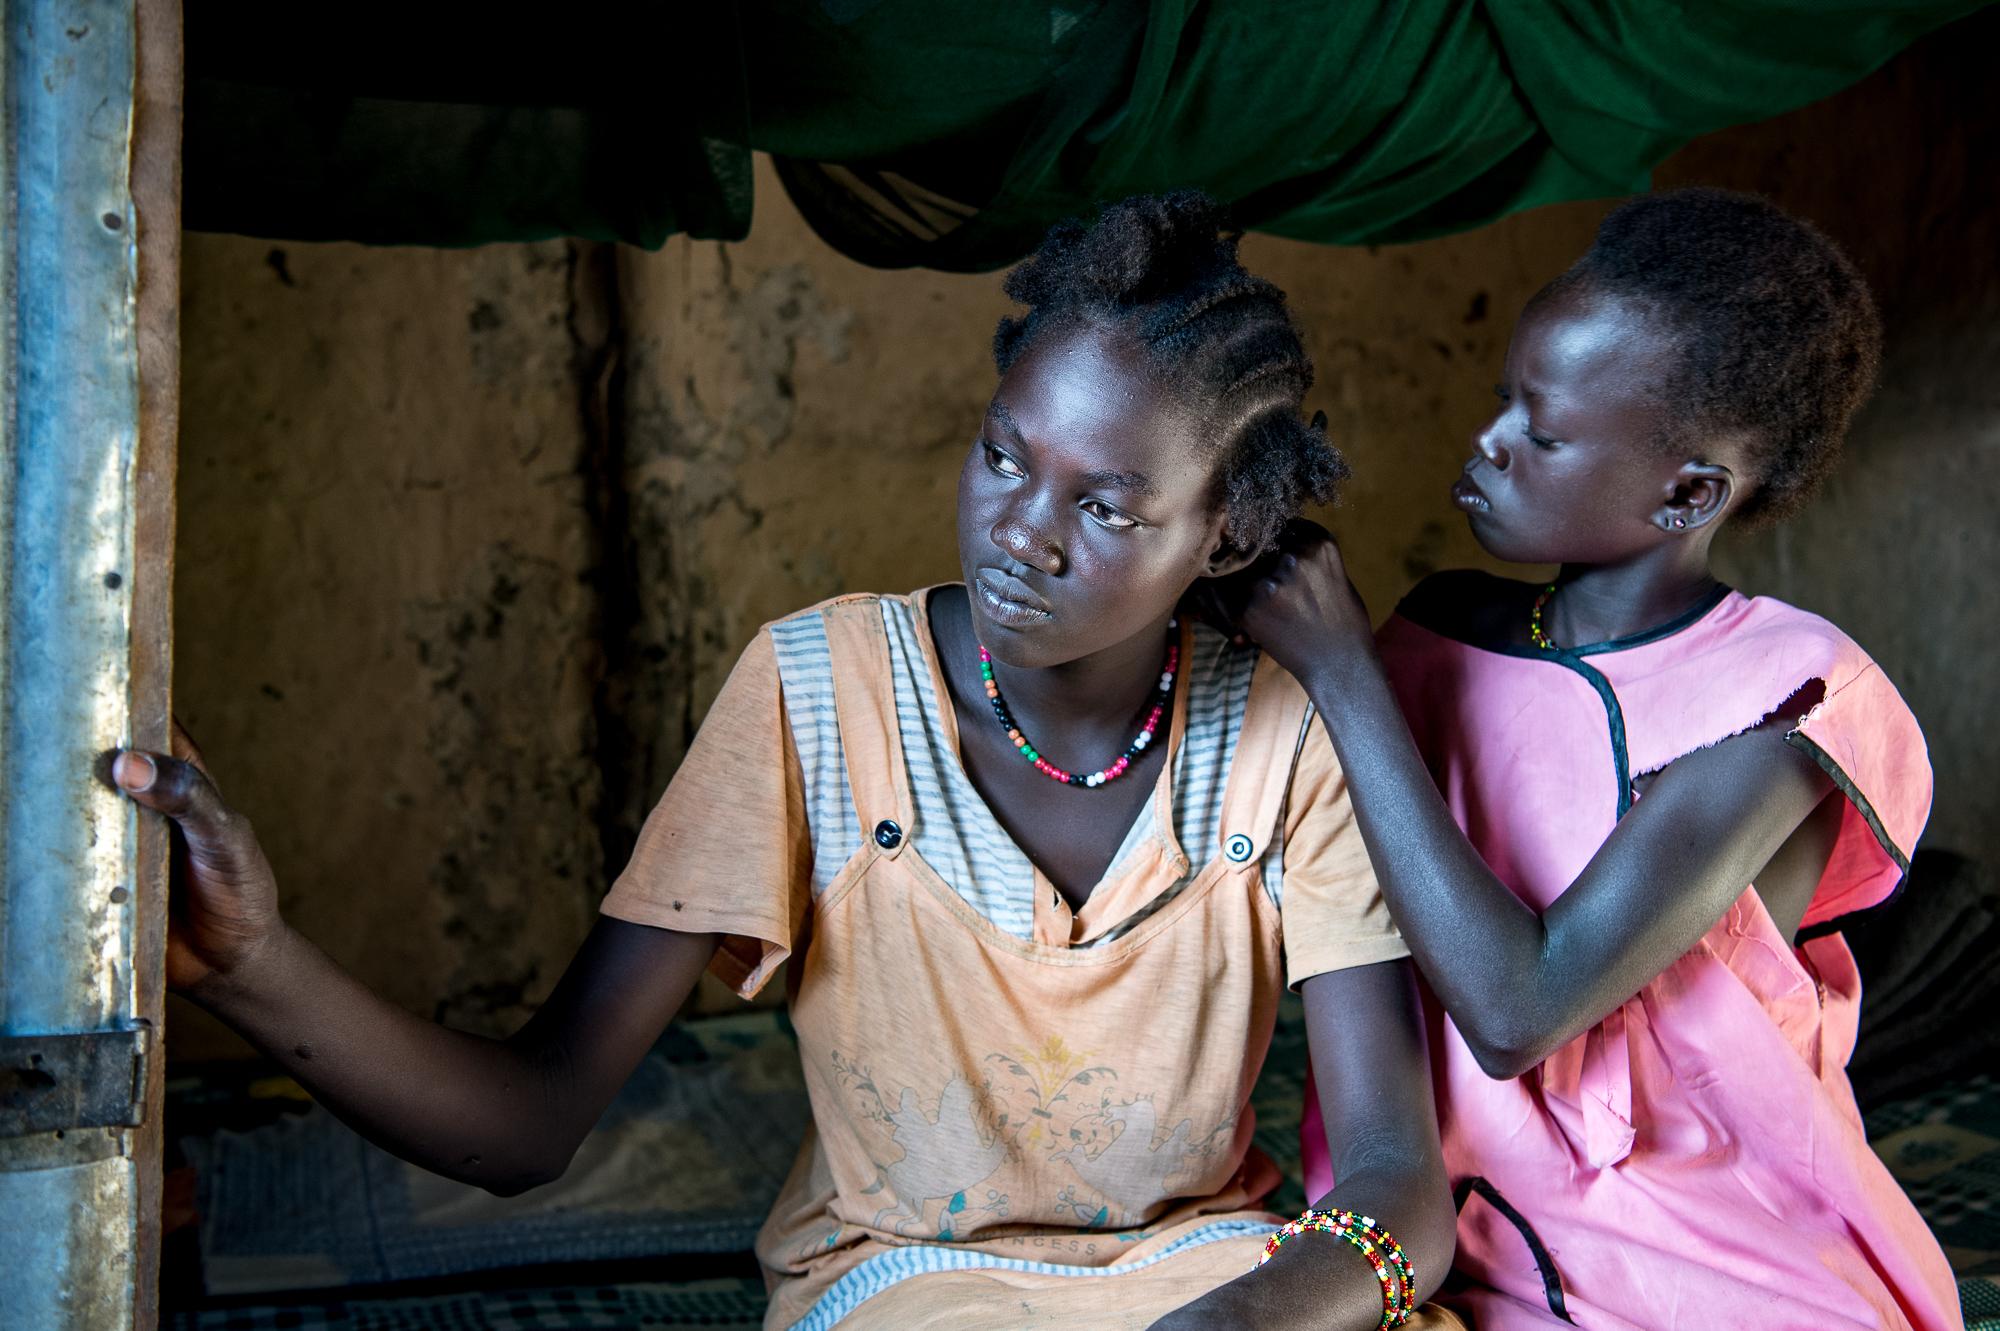 AE_SS16_UNICEF__3542.jpg